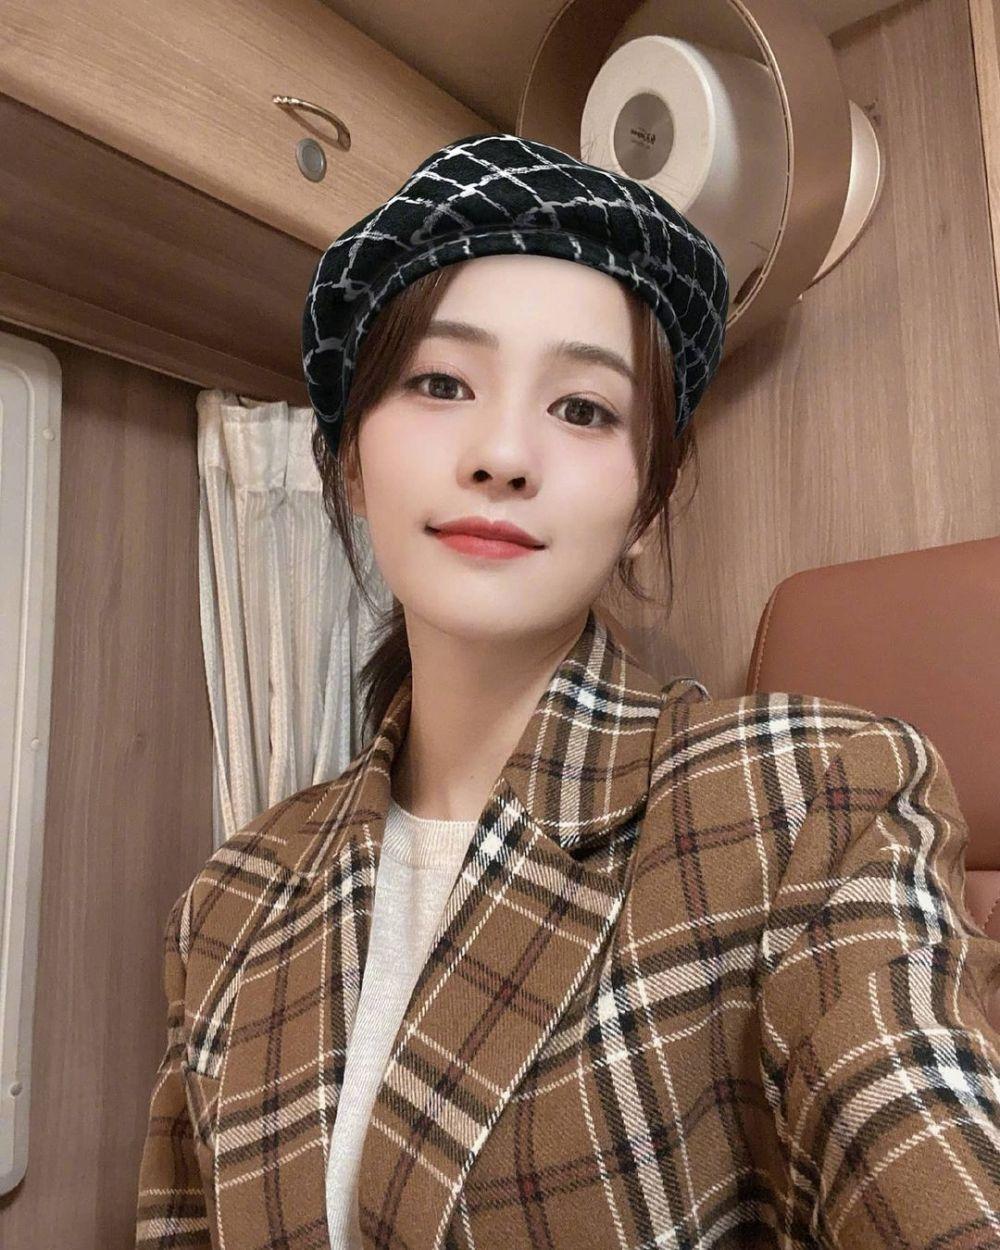 10 Fakta Bai Lu, Sosok Karyawan Memesona di CDrama Love is Sweet